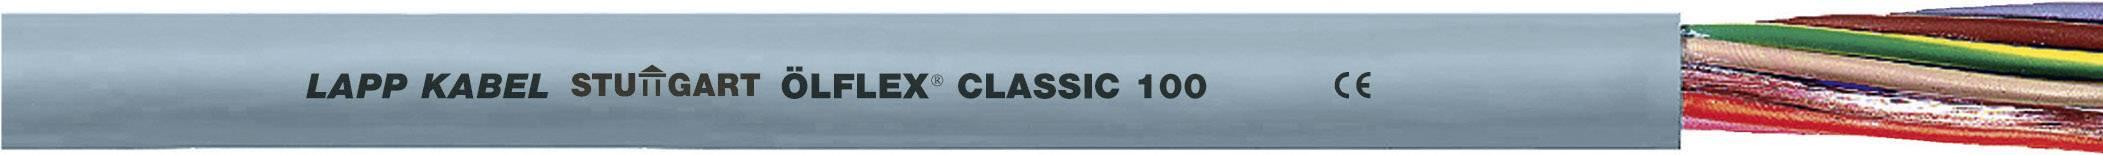 Kabel LappKabel Ölflex CLASSIC 100 10G0,75 (0010029), PVC, 9,6 mm, 500 V, šedá, 100 m